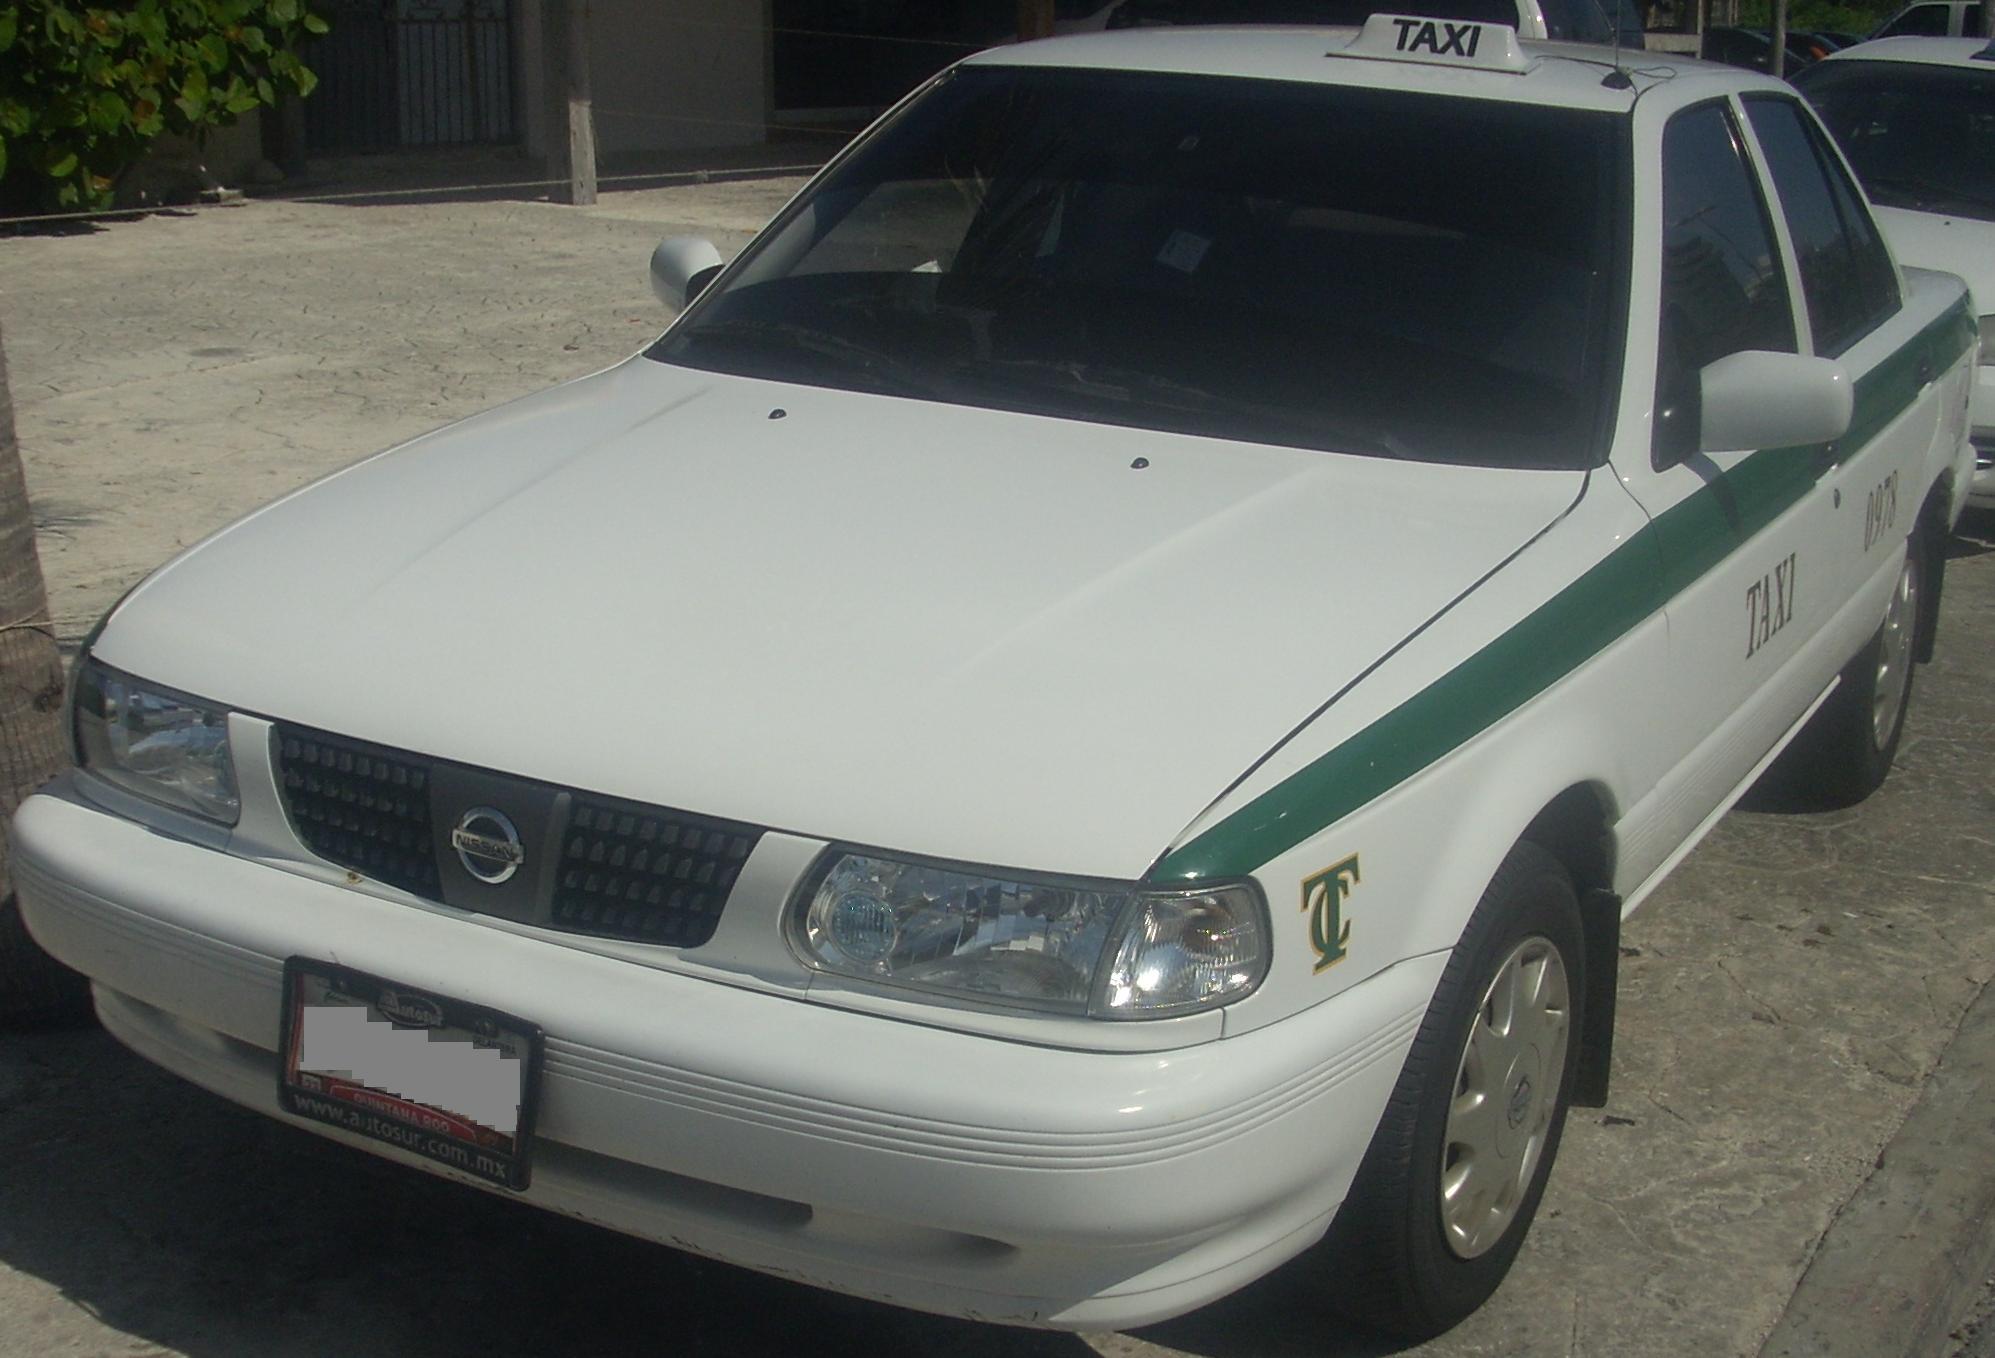 File:Nissan Tsuru Taxicab jpg - Wikimedia Commons